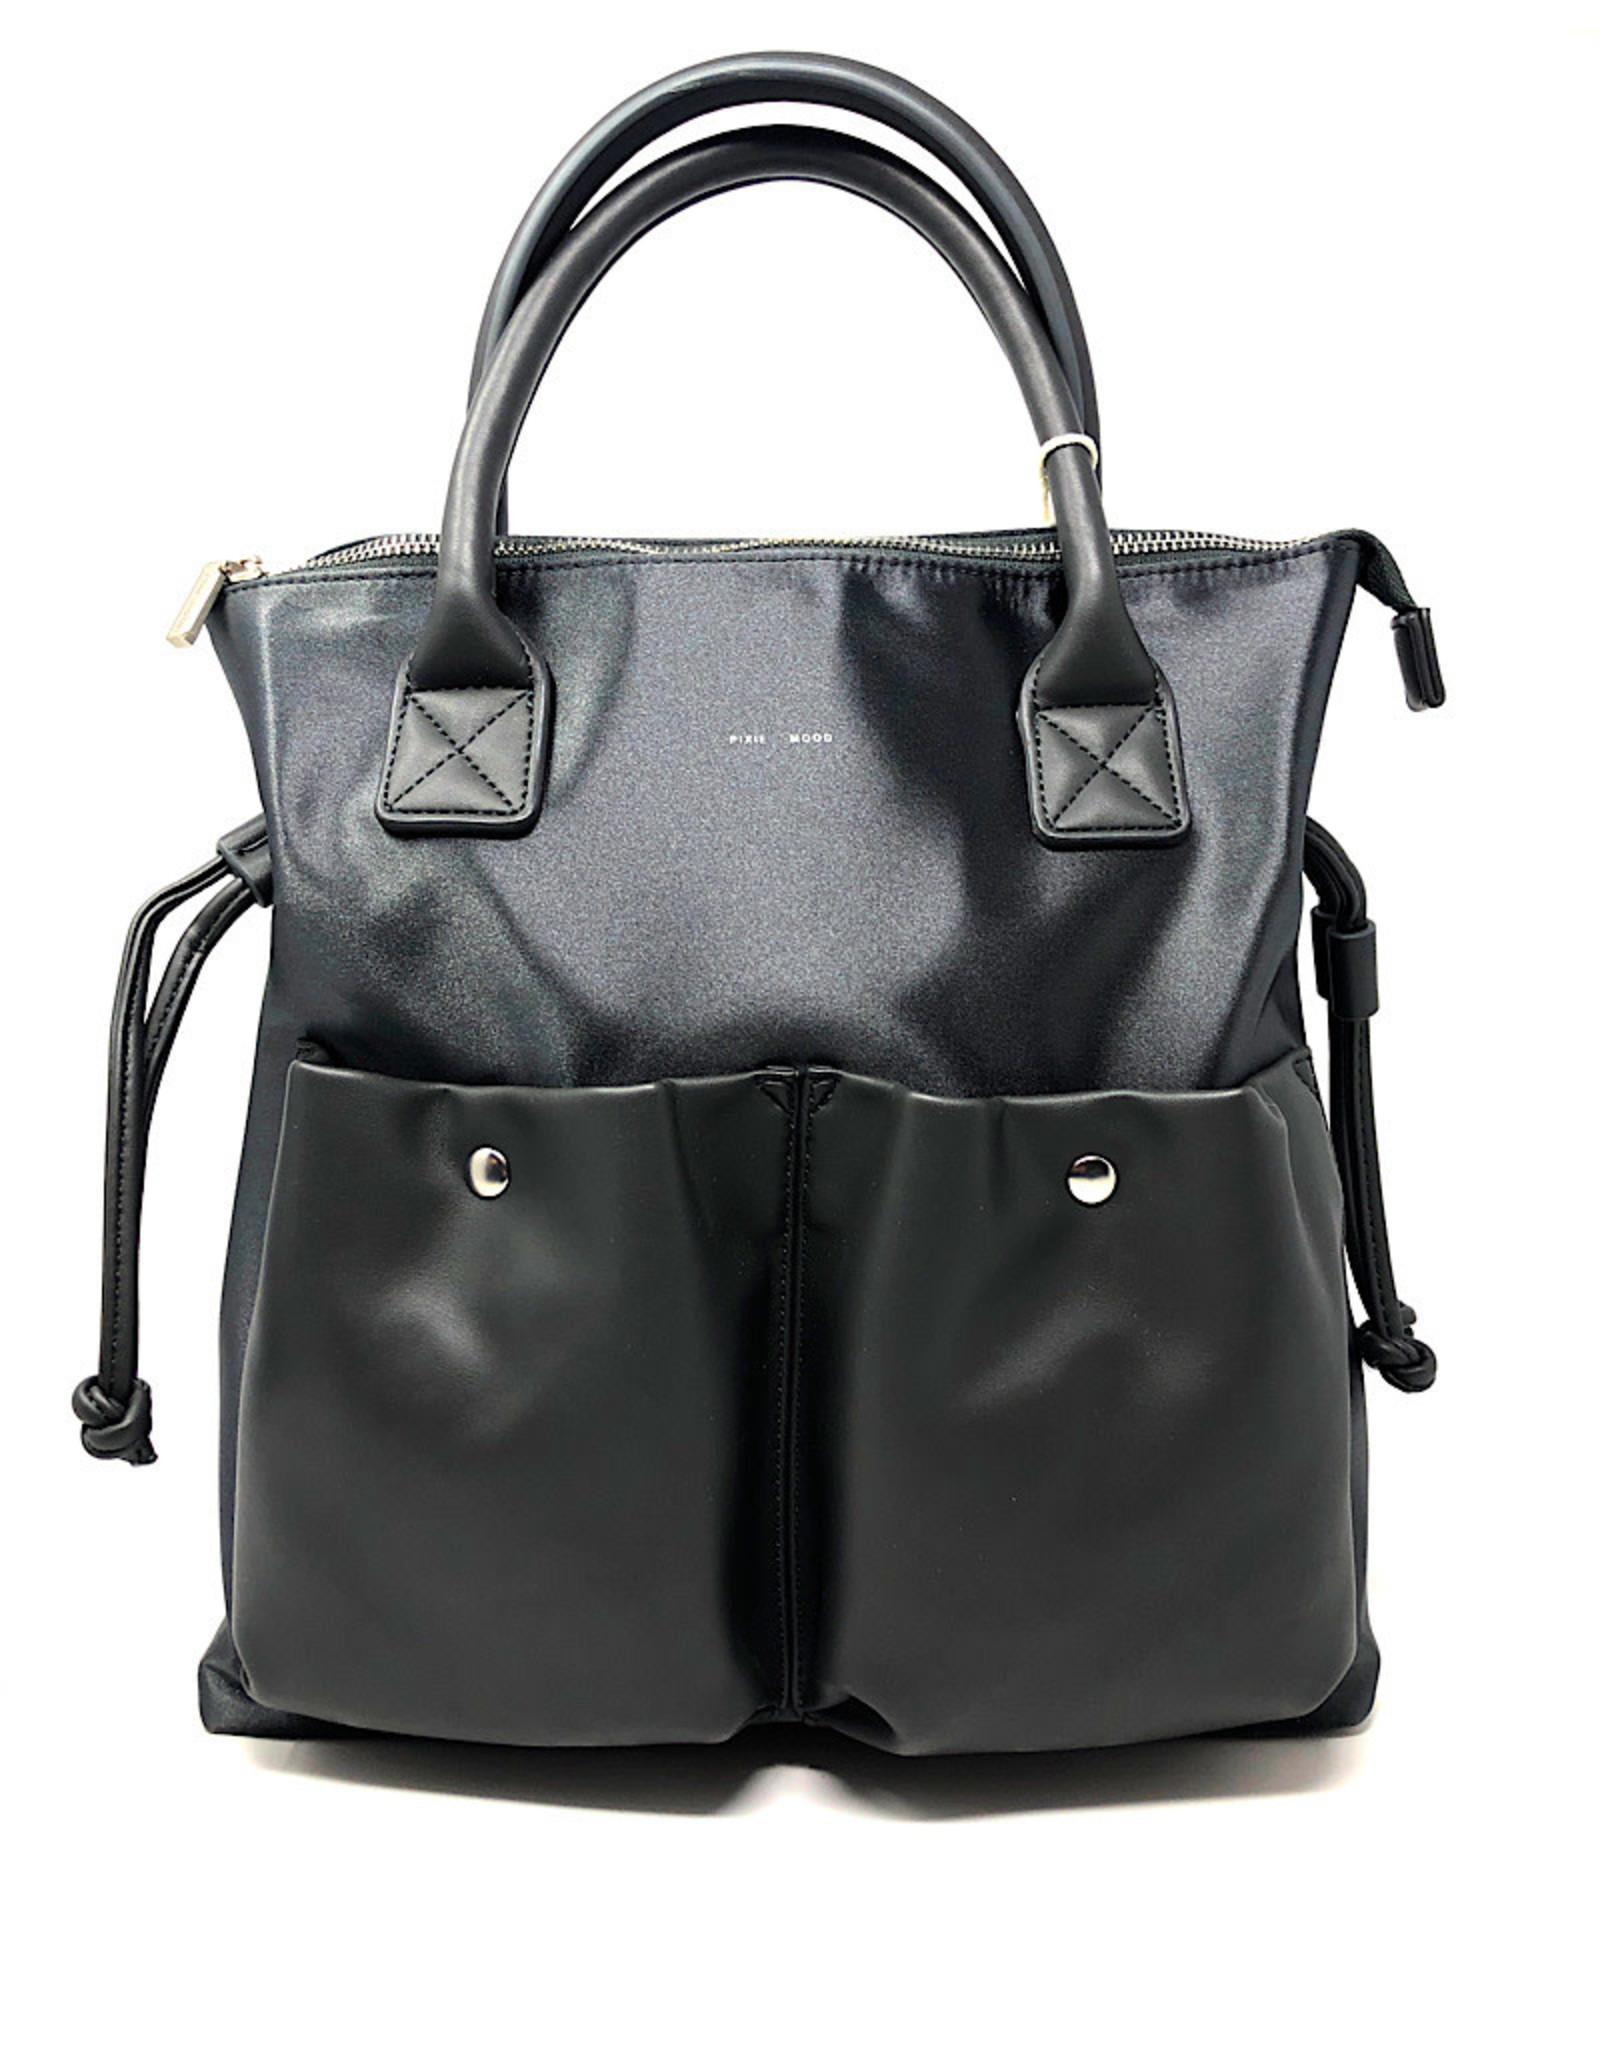 Pixie Mood Bag Avery Tote Satin Grey